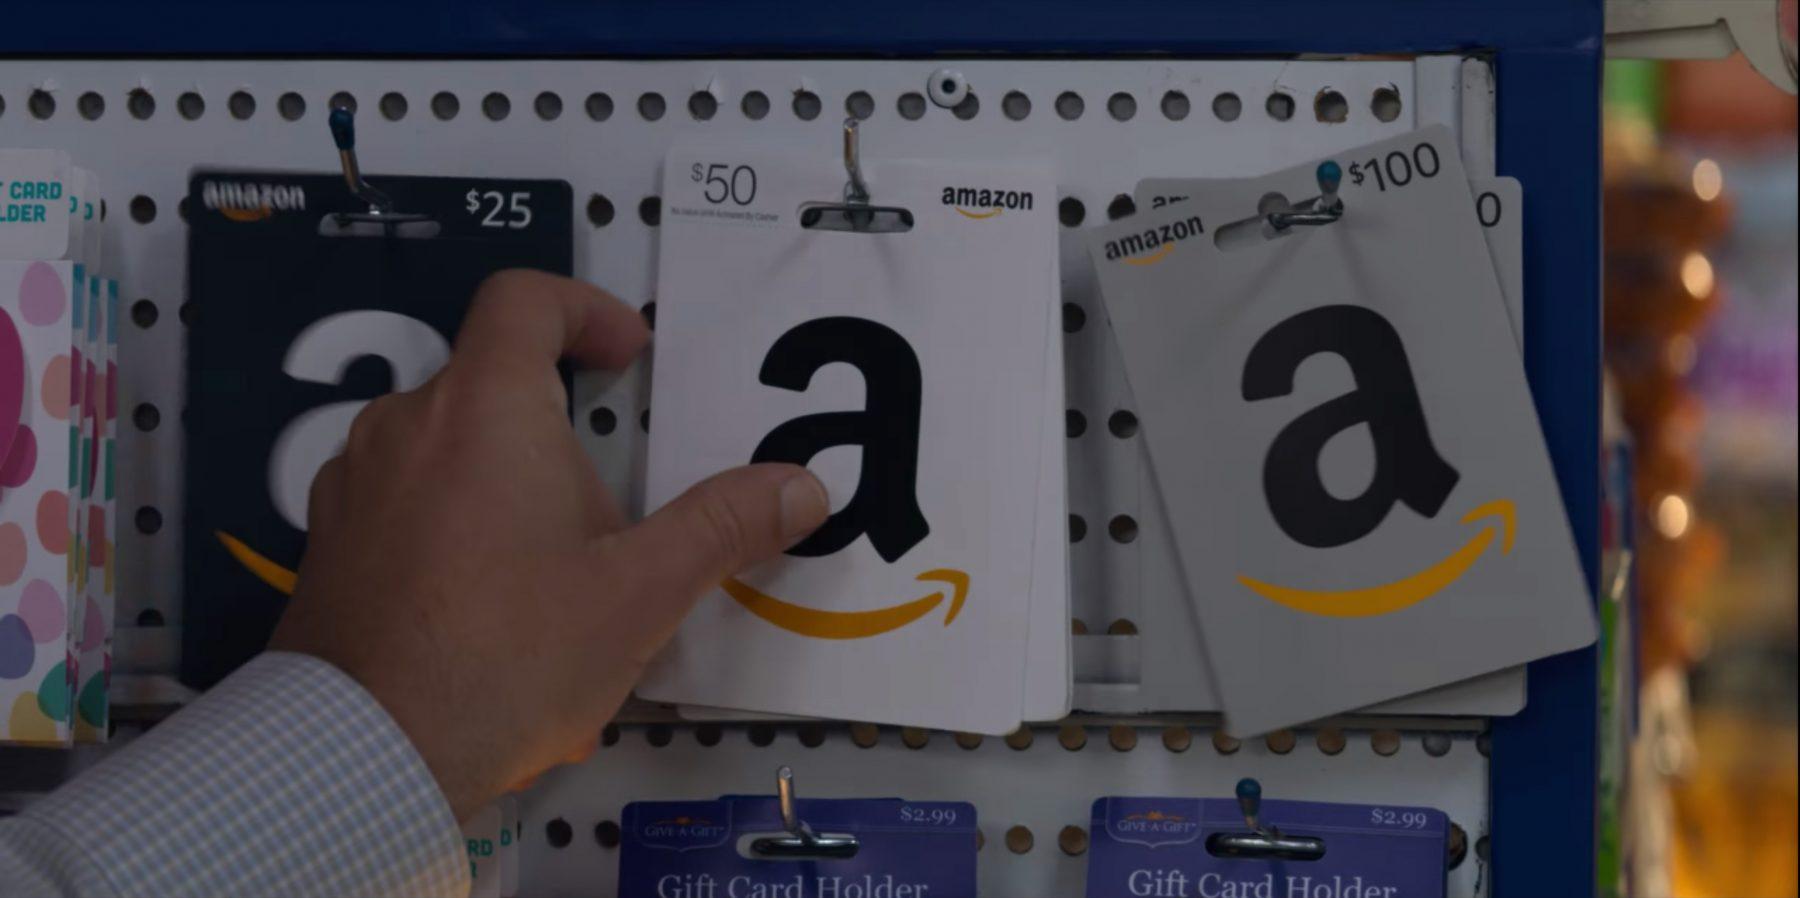 Amazon Gift Card In Murder Mystery